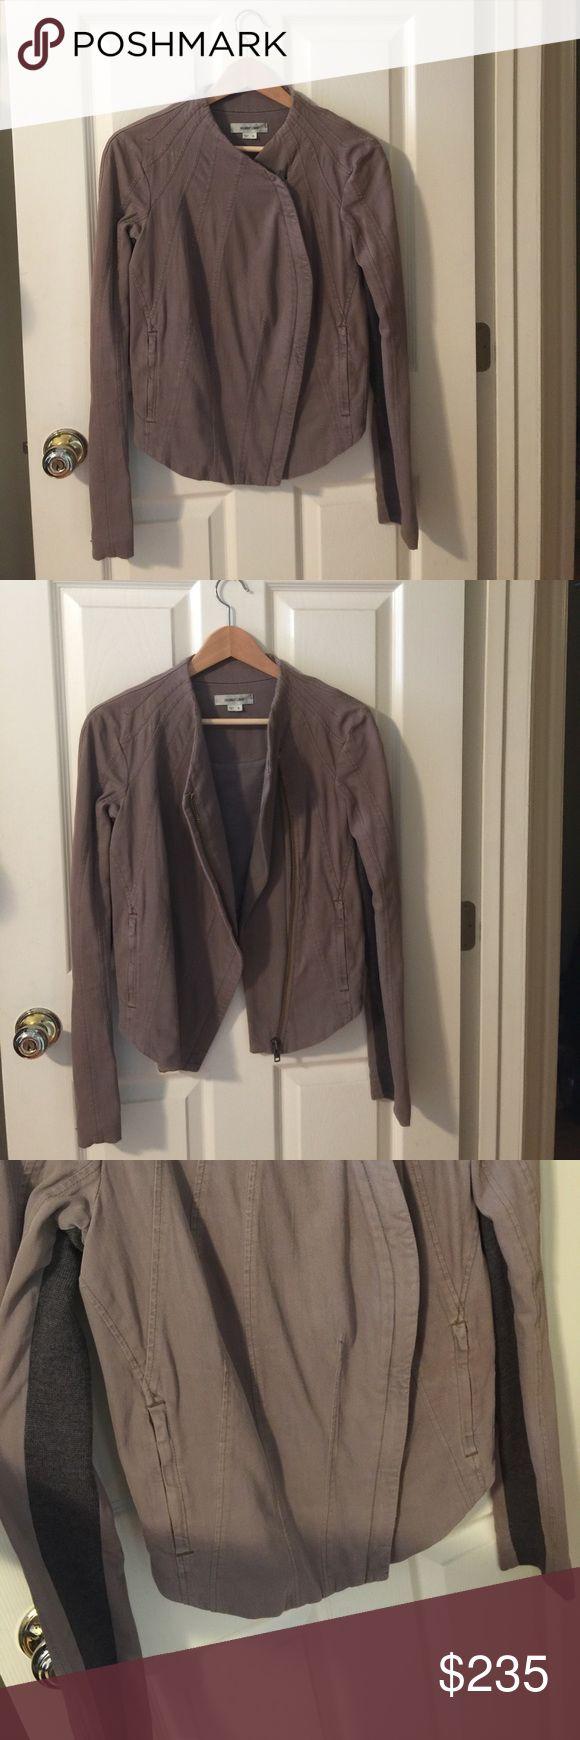 Helmut Lang blazer jacket Helmut Lang blazer jacket. Knit arms. Zippers on sleeves. Looks amazing on. Helmut Lang Jackets & Coats